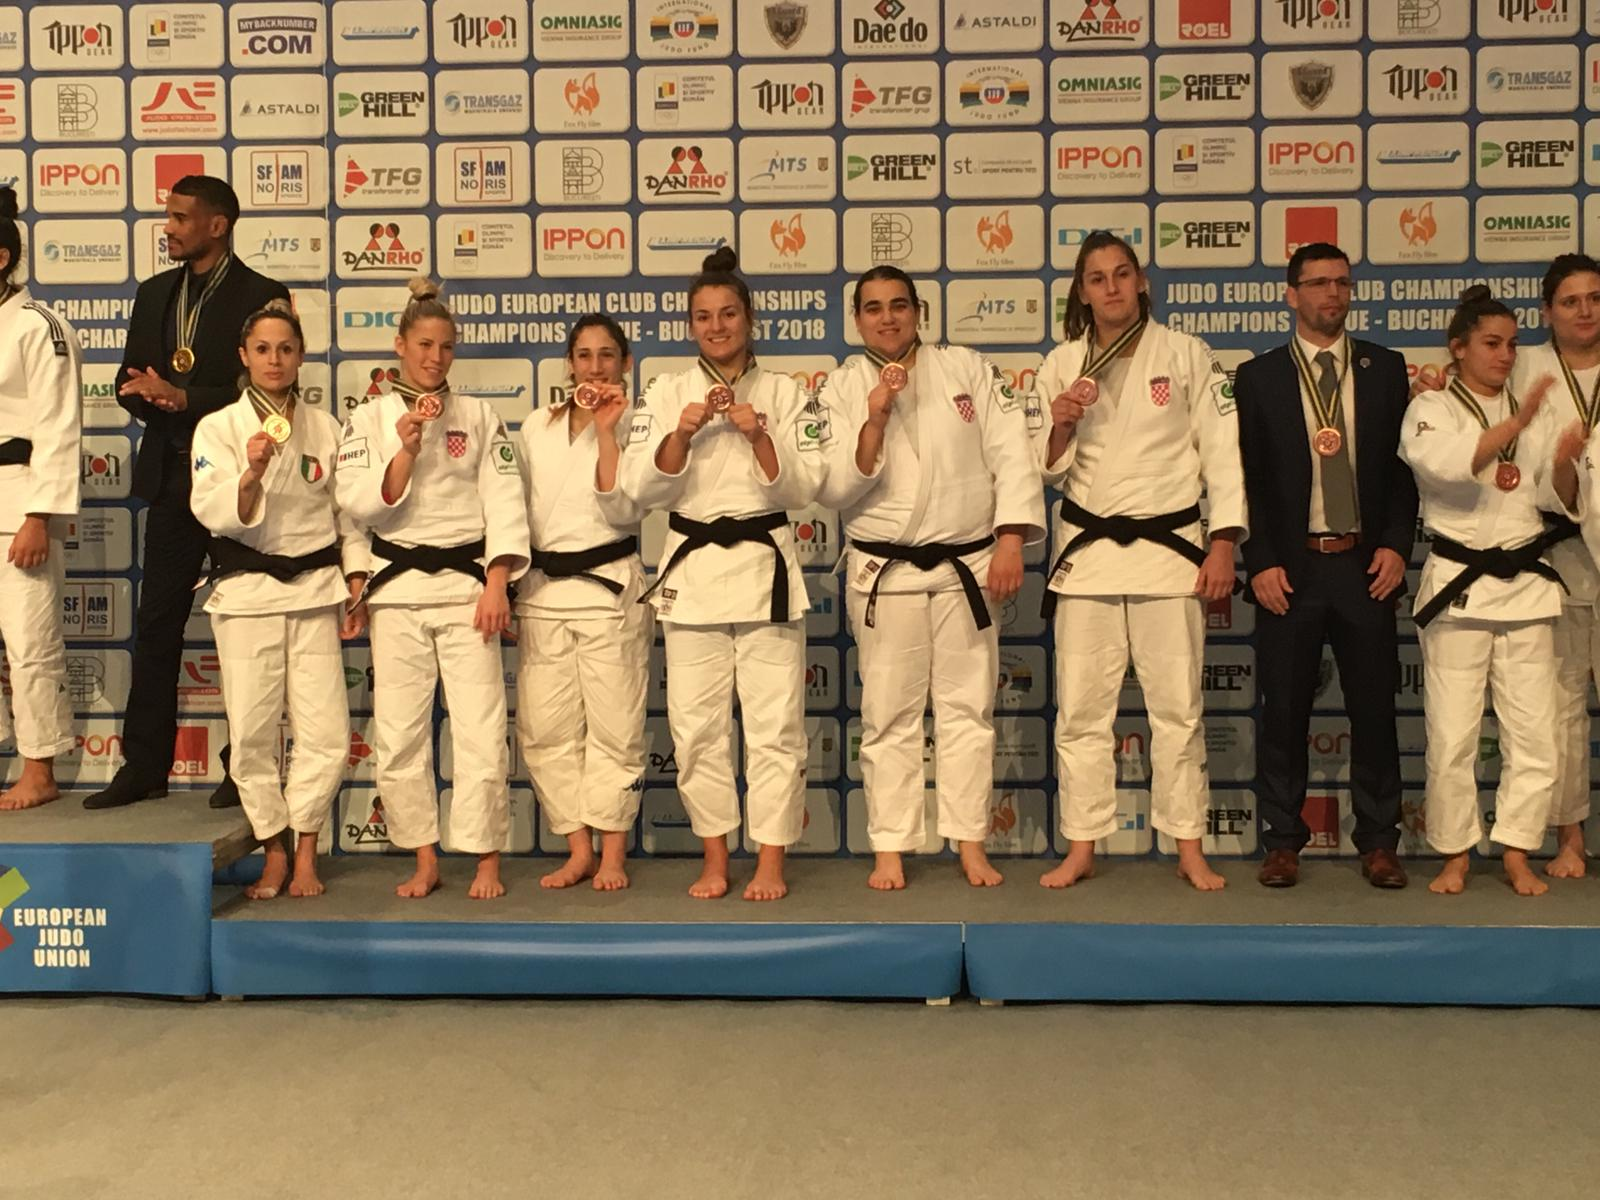 Vinkovci Liga prvaka medalja